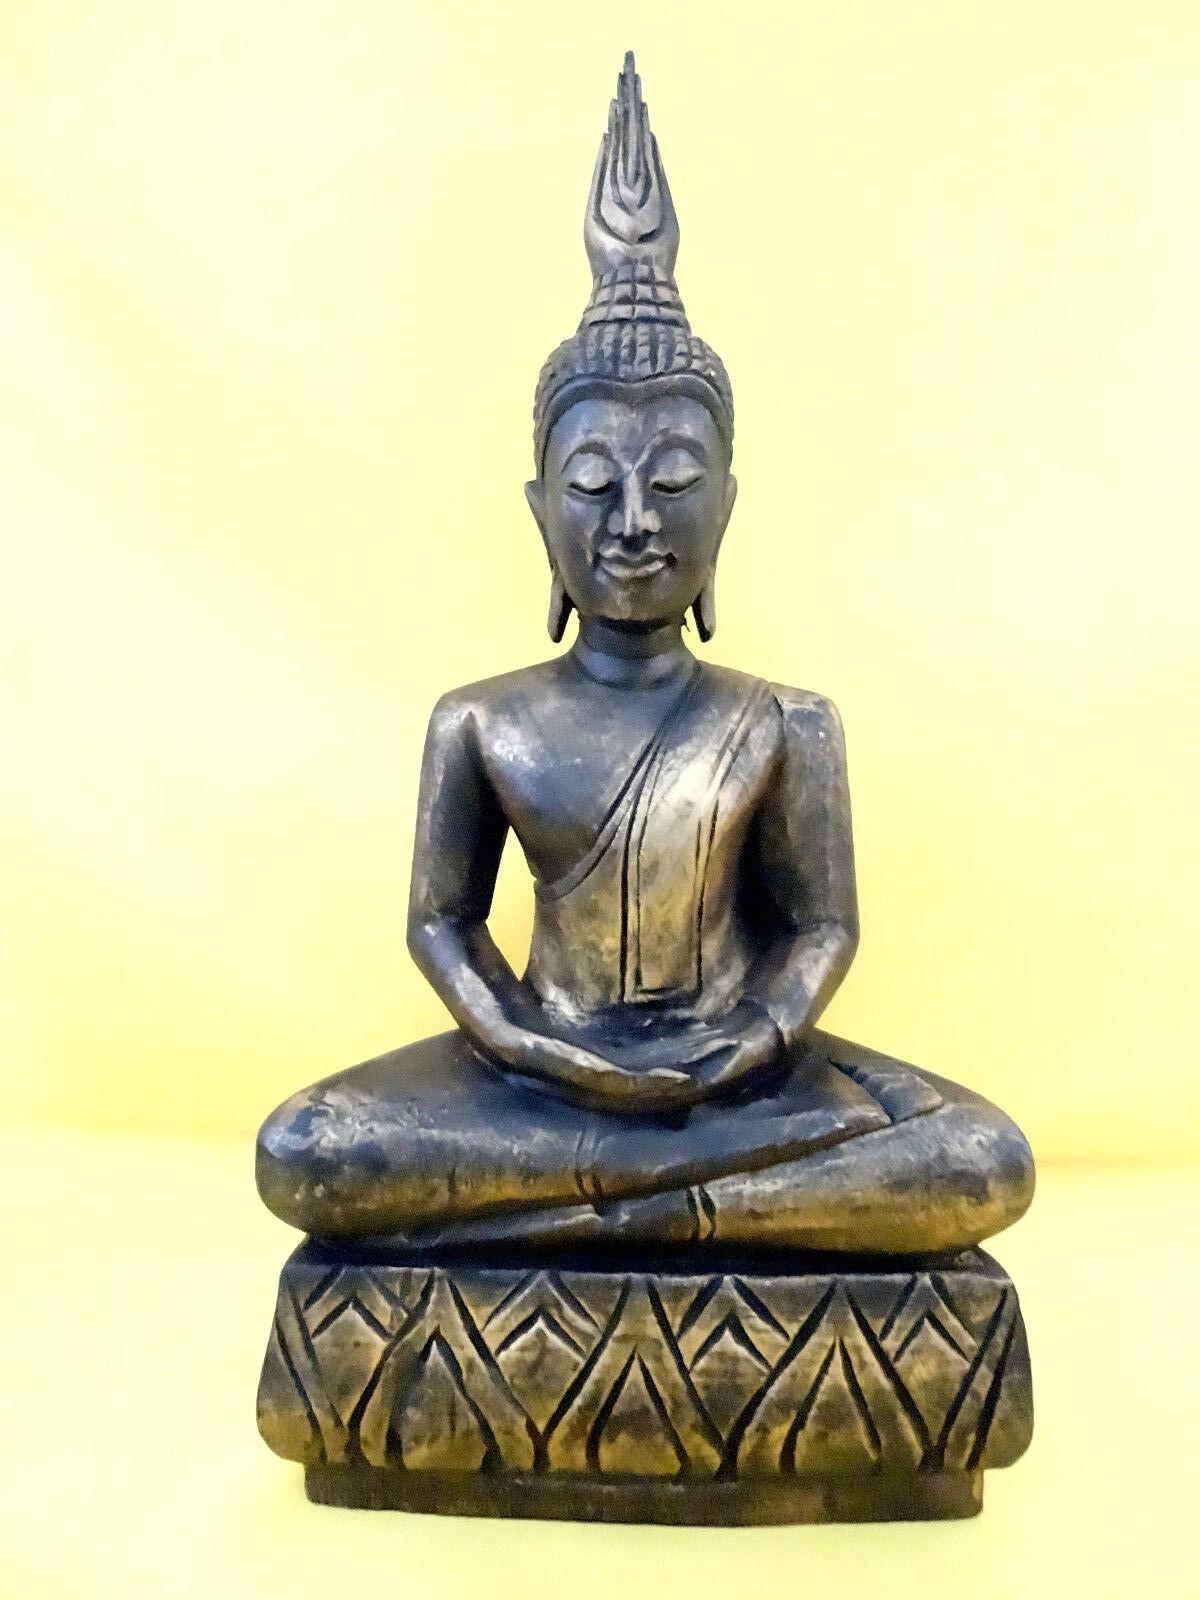 ASIEN Buddha Holz Holz Holz Unikat  Dekoration Kunst Tempel Skulptur Geschenk Buddhismus 95b068